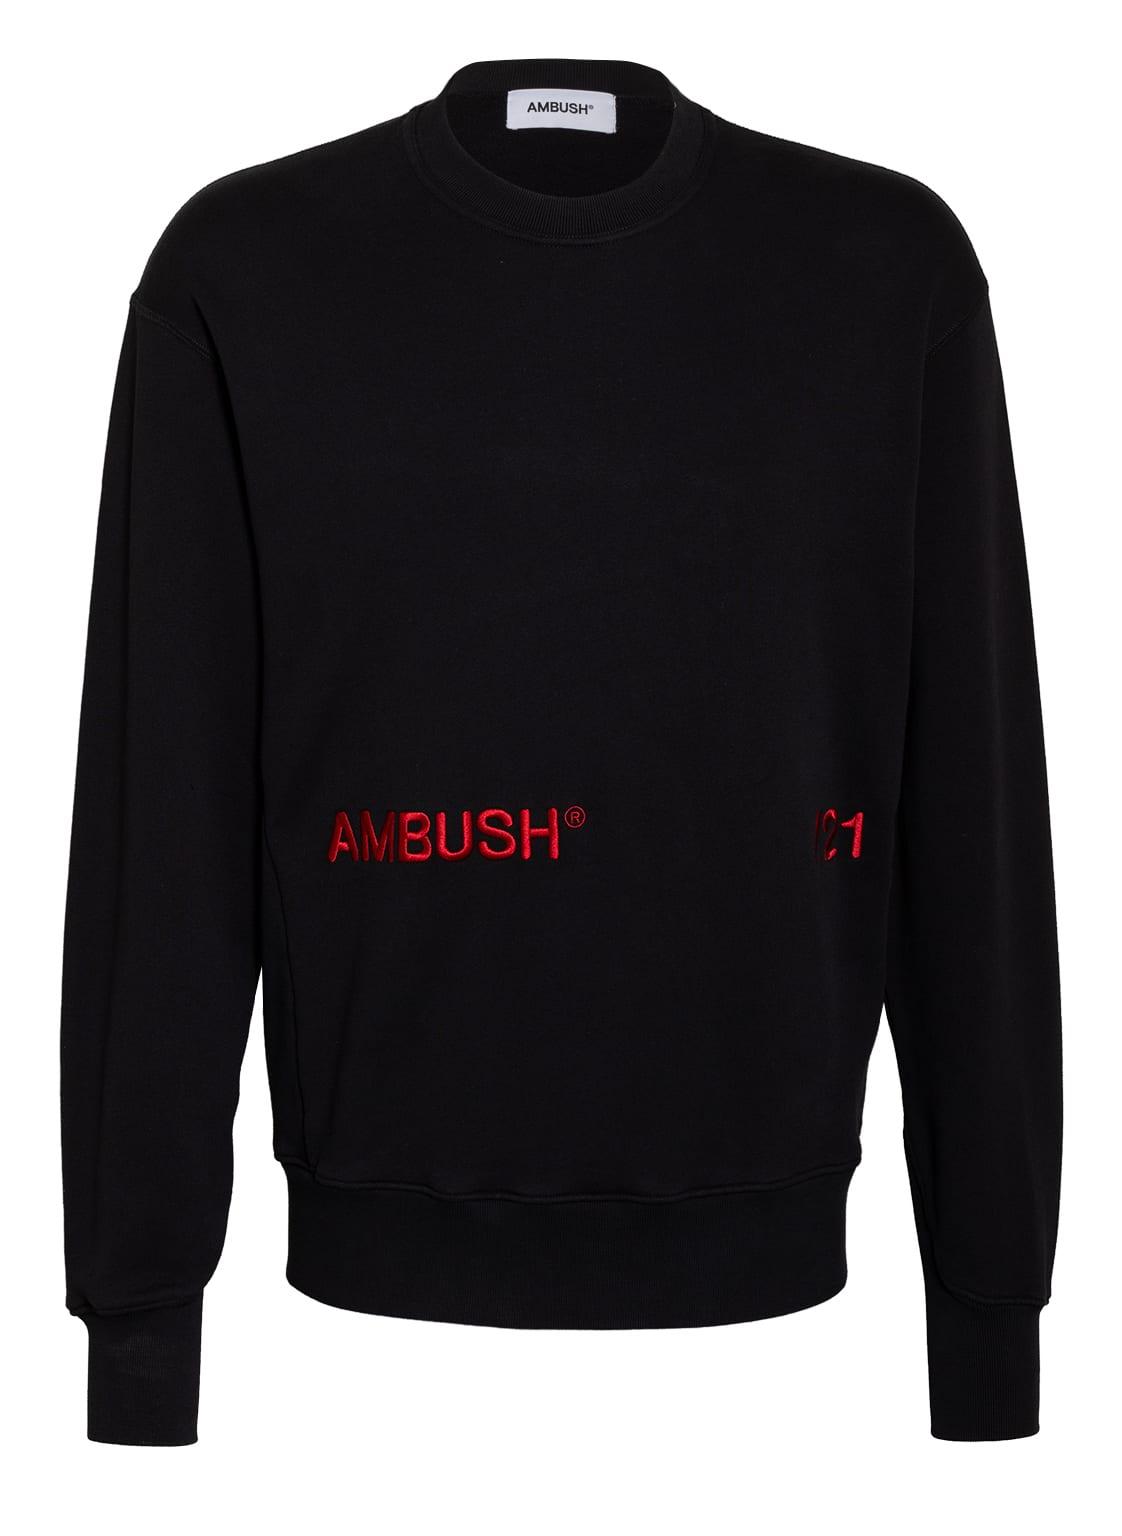 Image of Ambush Sweatshirt schwarz